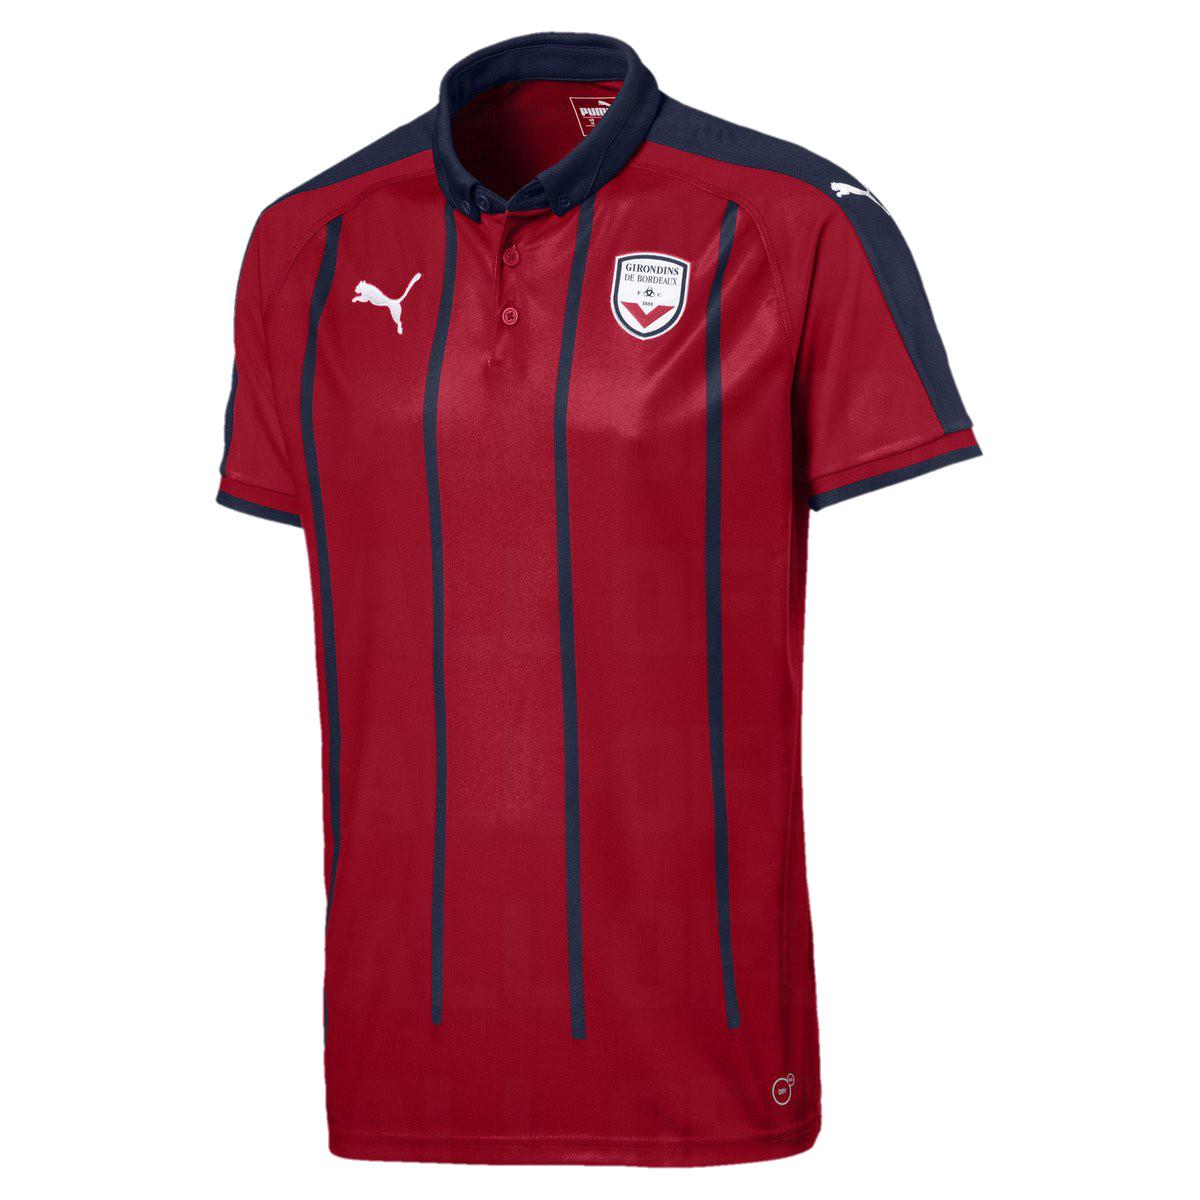 Girondins Bordeaux 2019 maillot third Puma 18 19